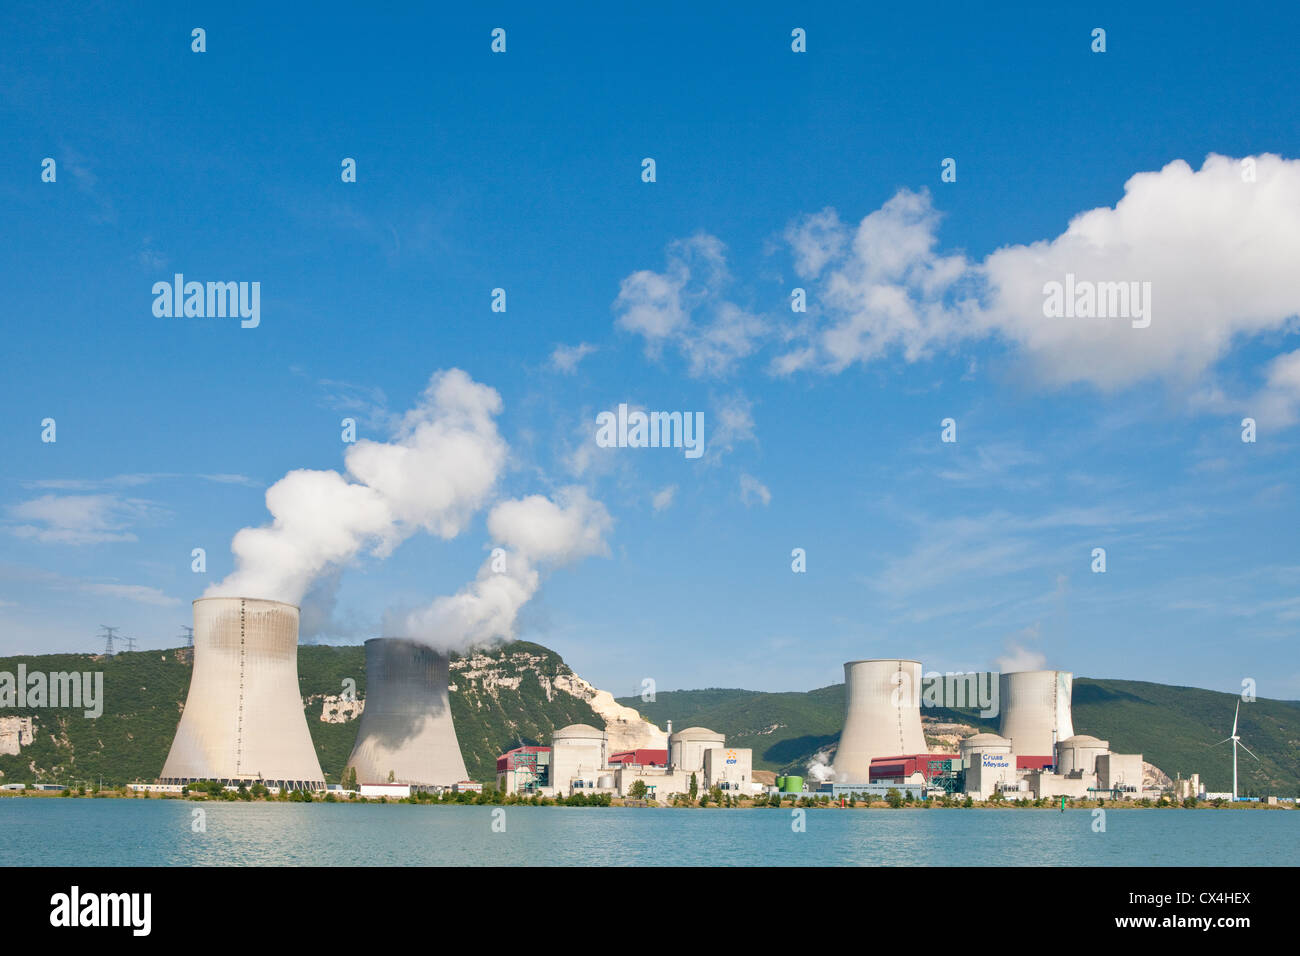 Cruas-Meysse Nuclear Power Plant near Rhône River in south of France - Stock Image